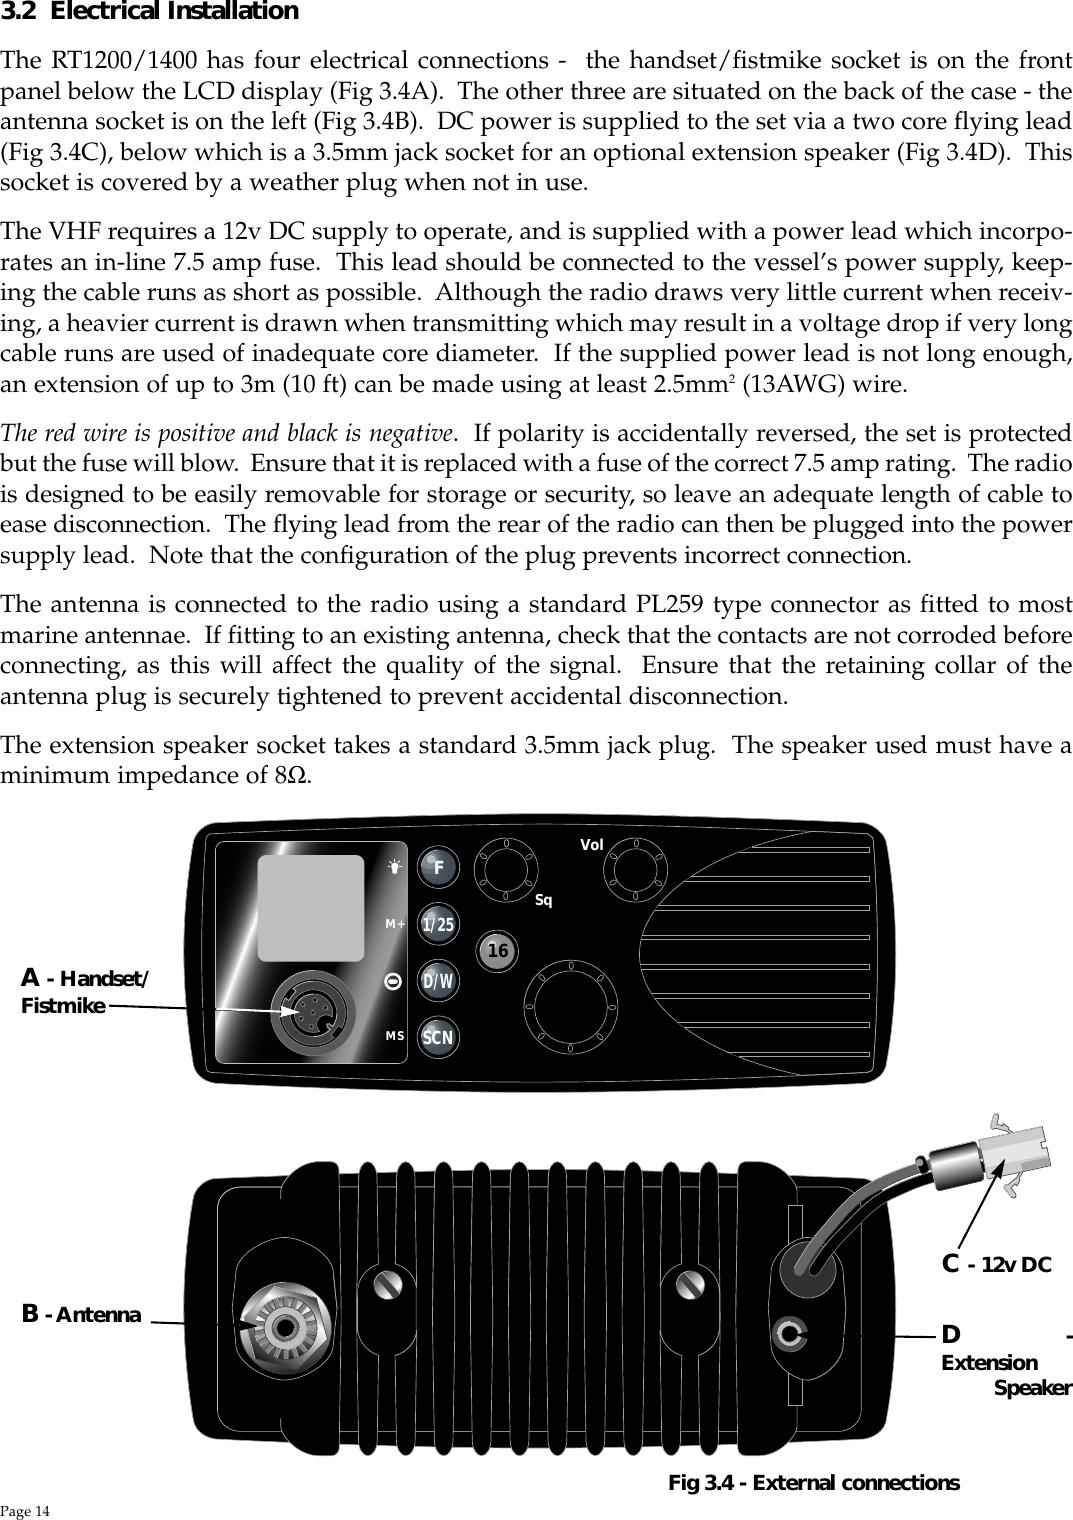 simrad radio manual